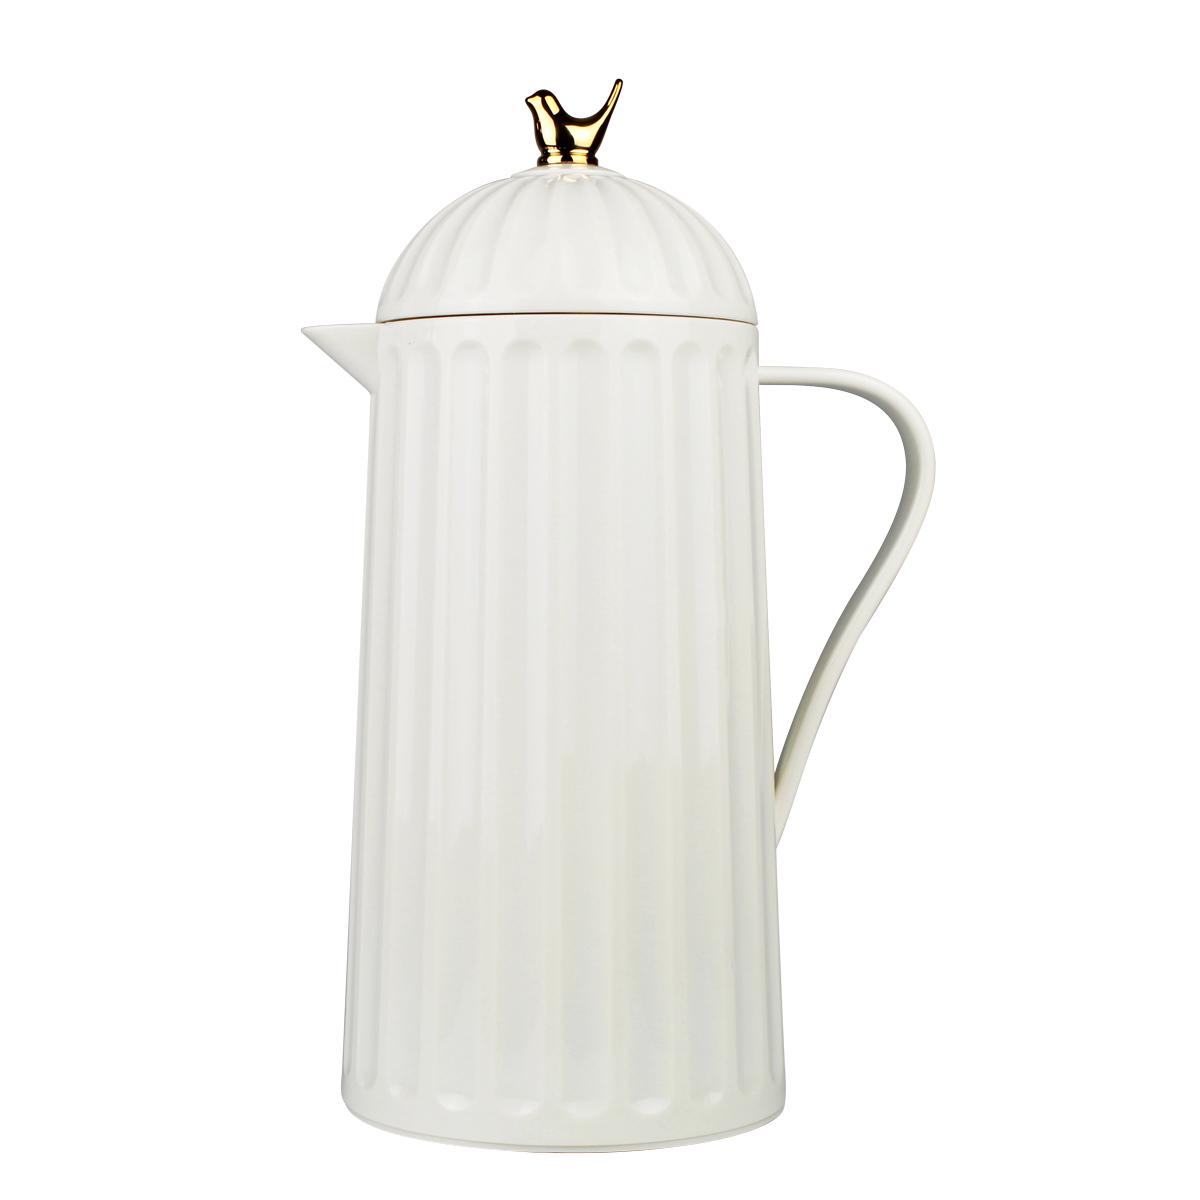 Garrafa Térmica De Plástico Bird Branca 1l Bon Gourmet